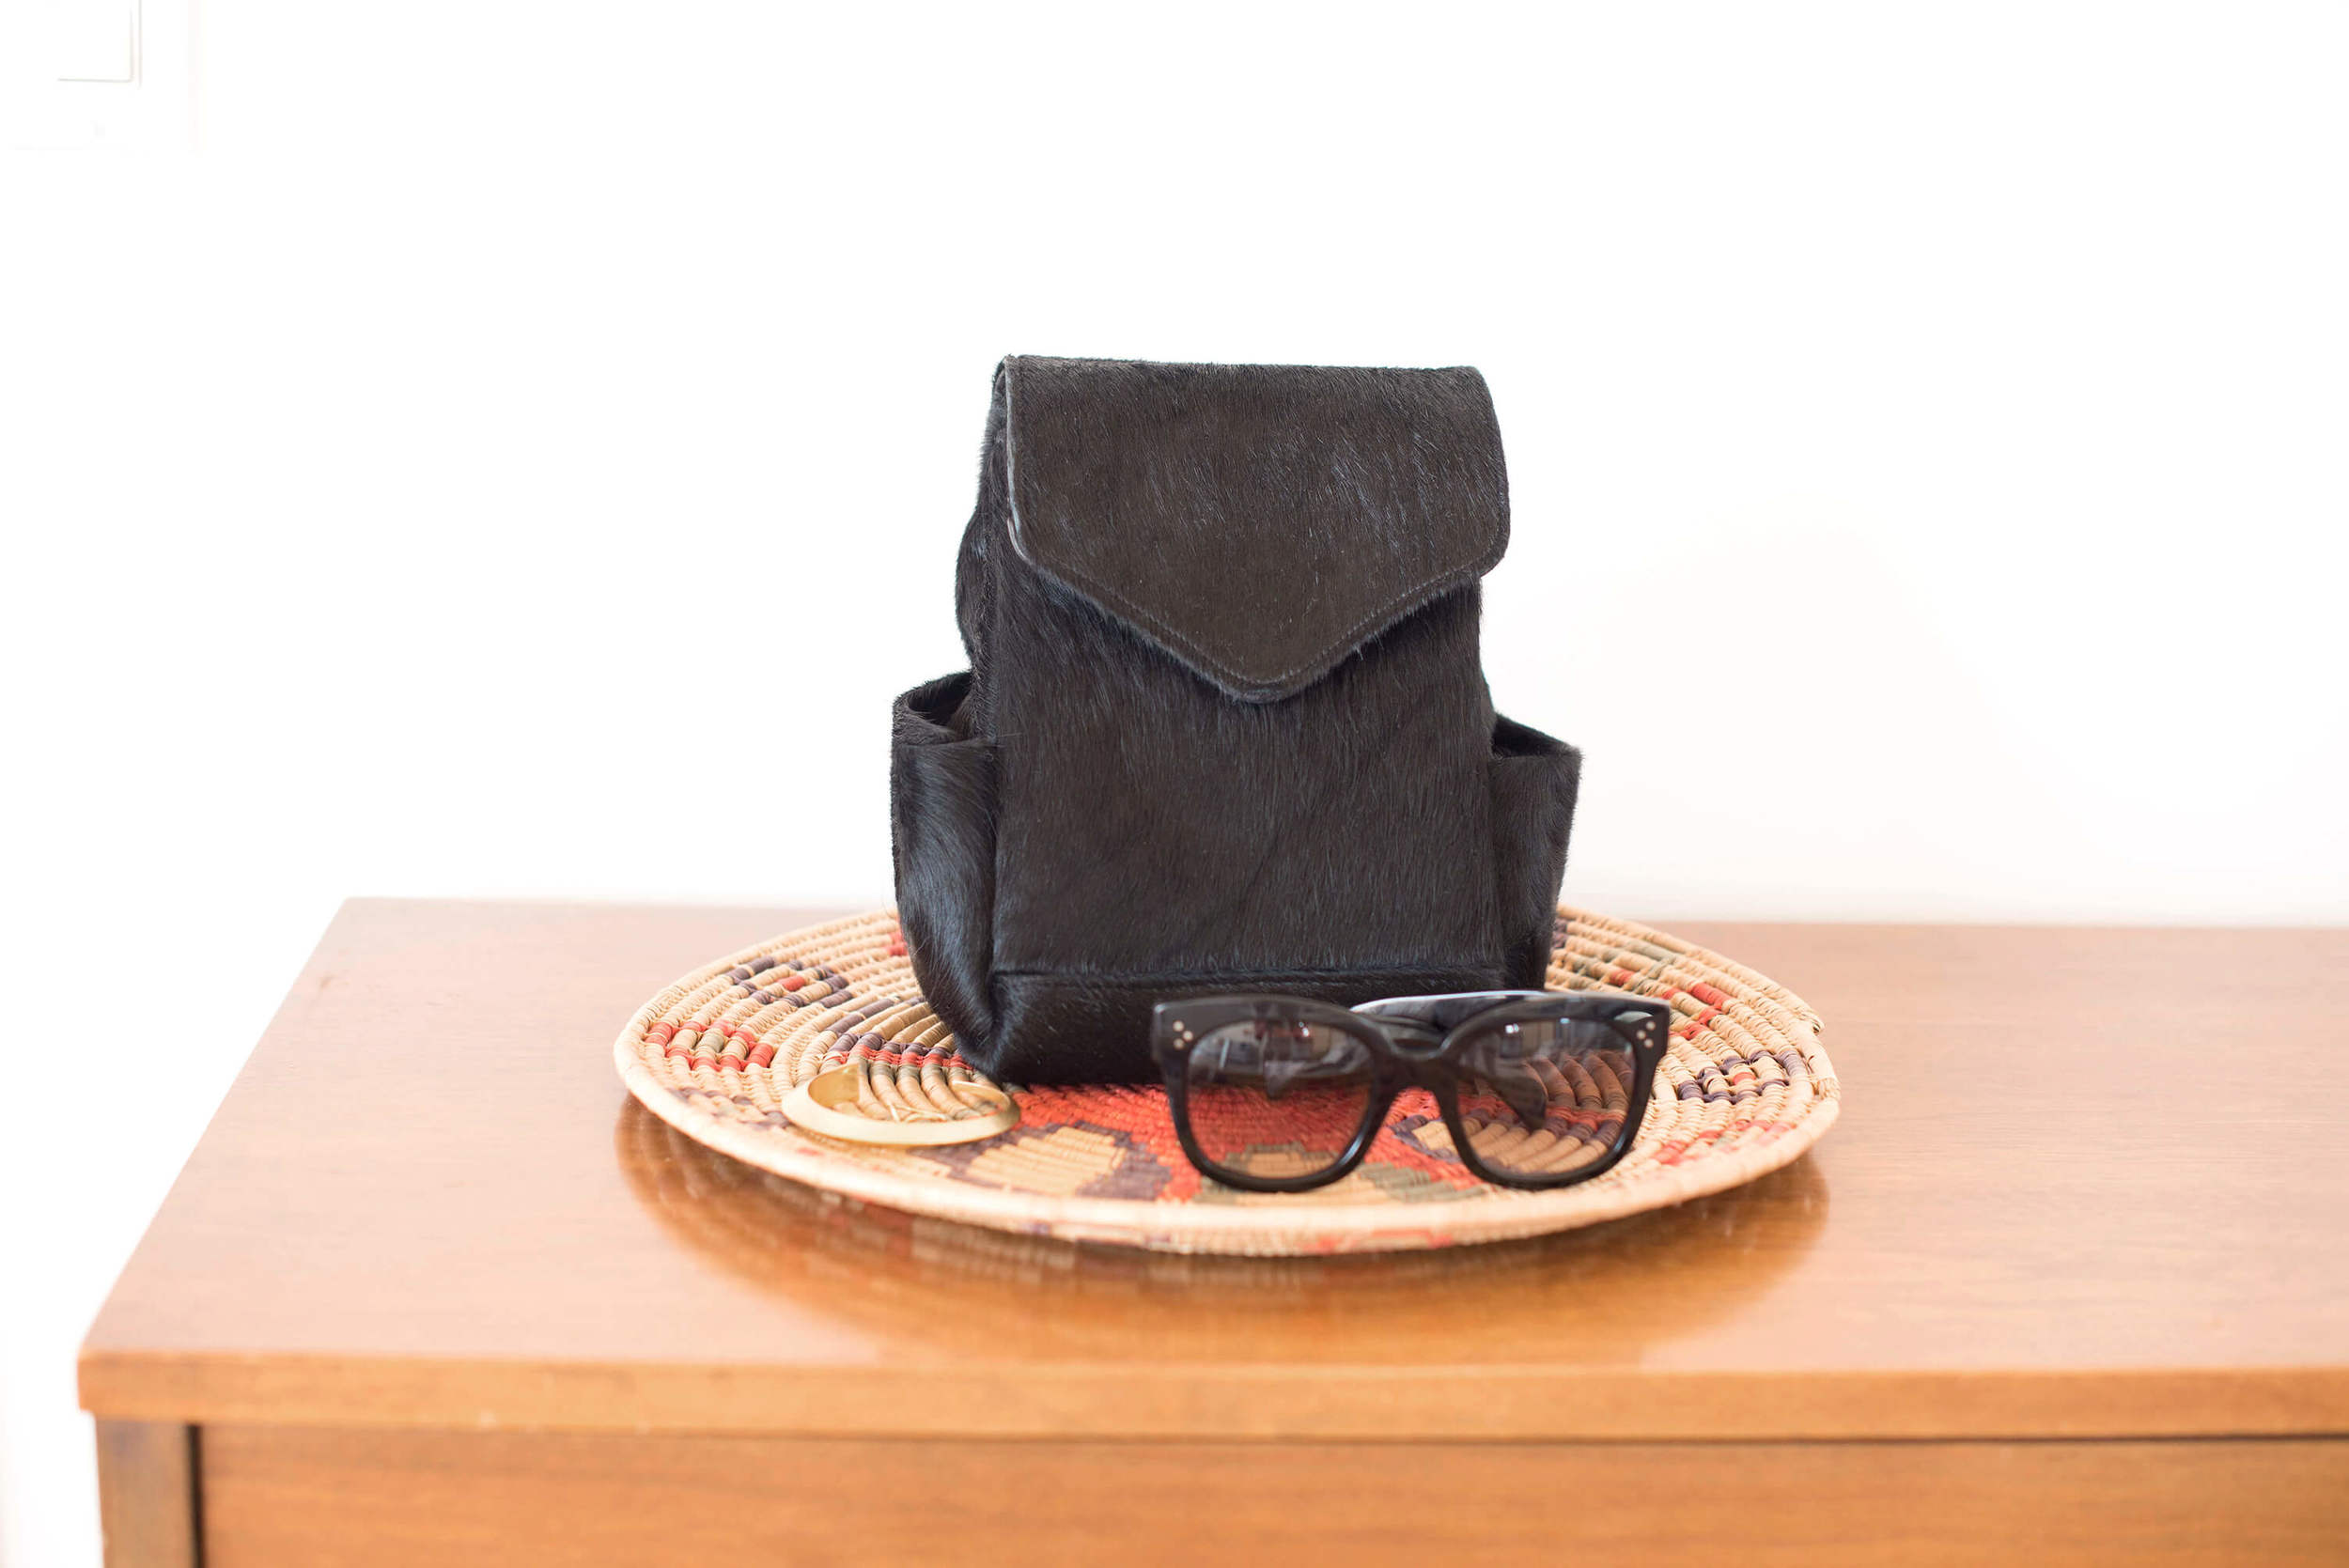 calf hair mini backpack and céline sunglasses